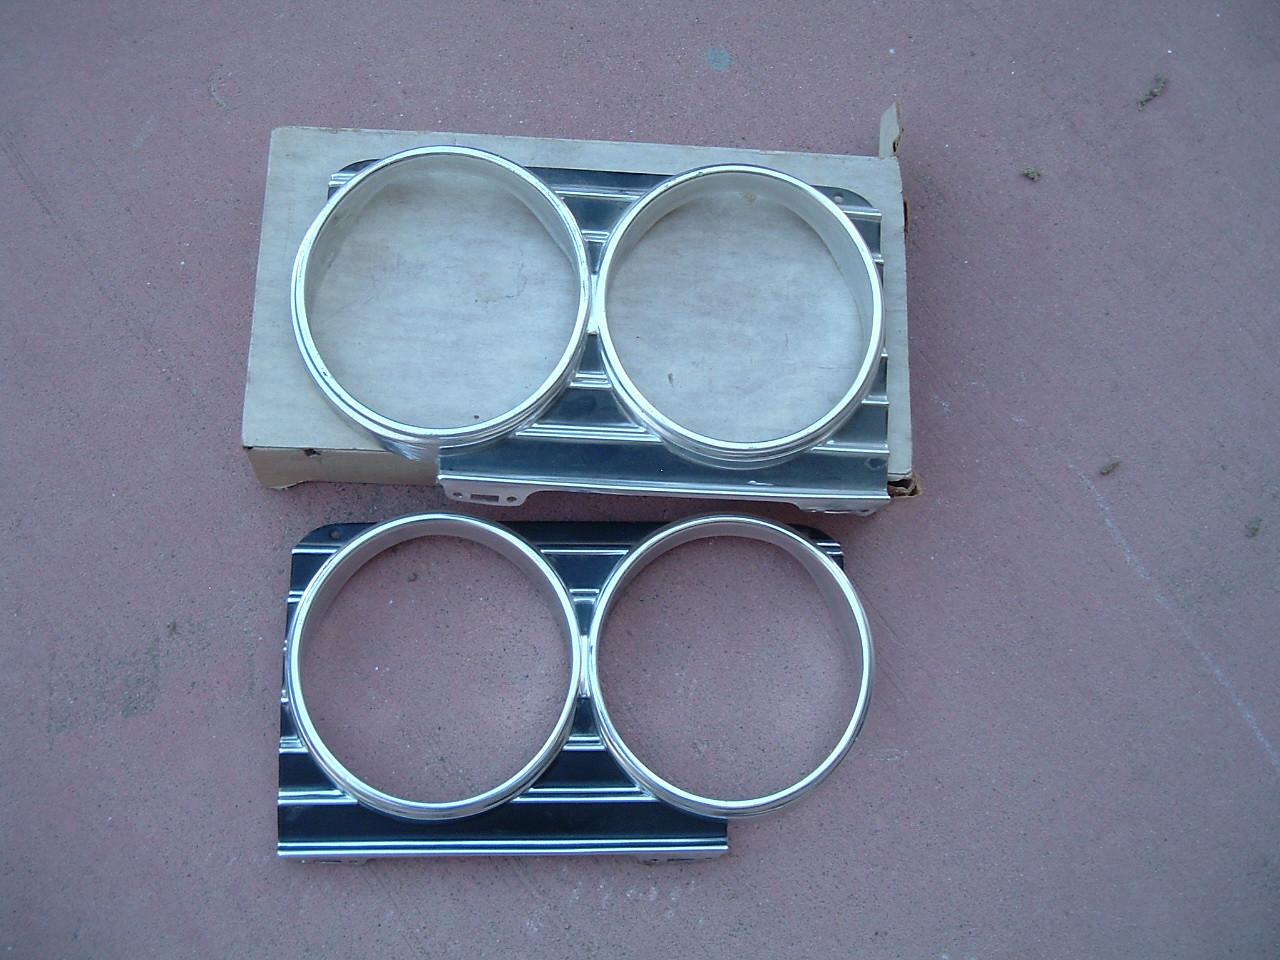 1966 chevrolet impala headlight bezel nos gm 3869747/ 3869748 (z 3869747/48)